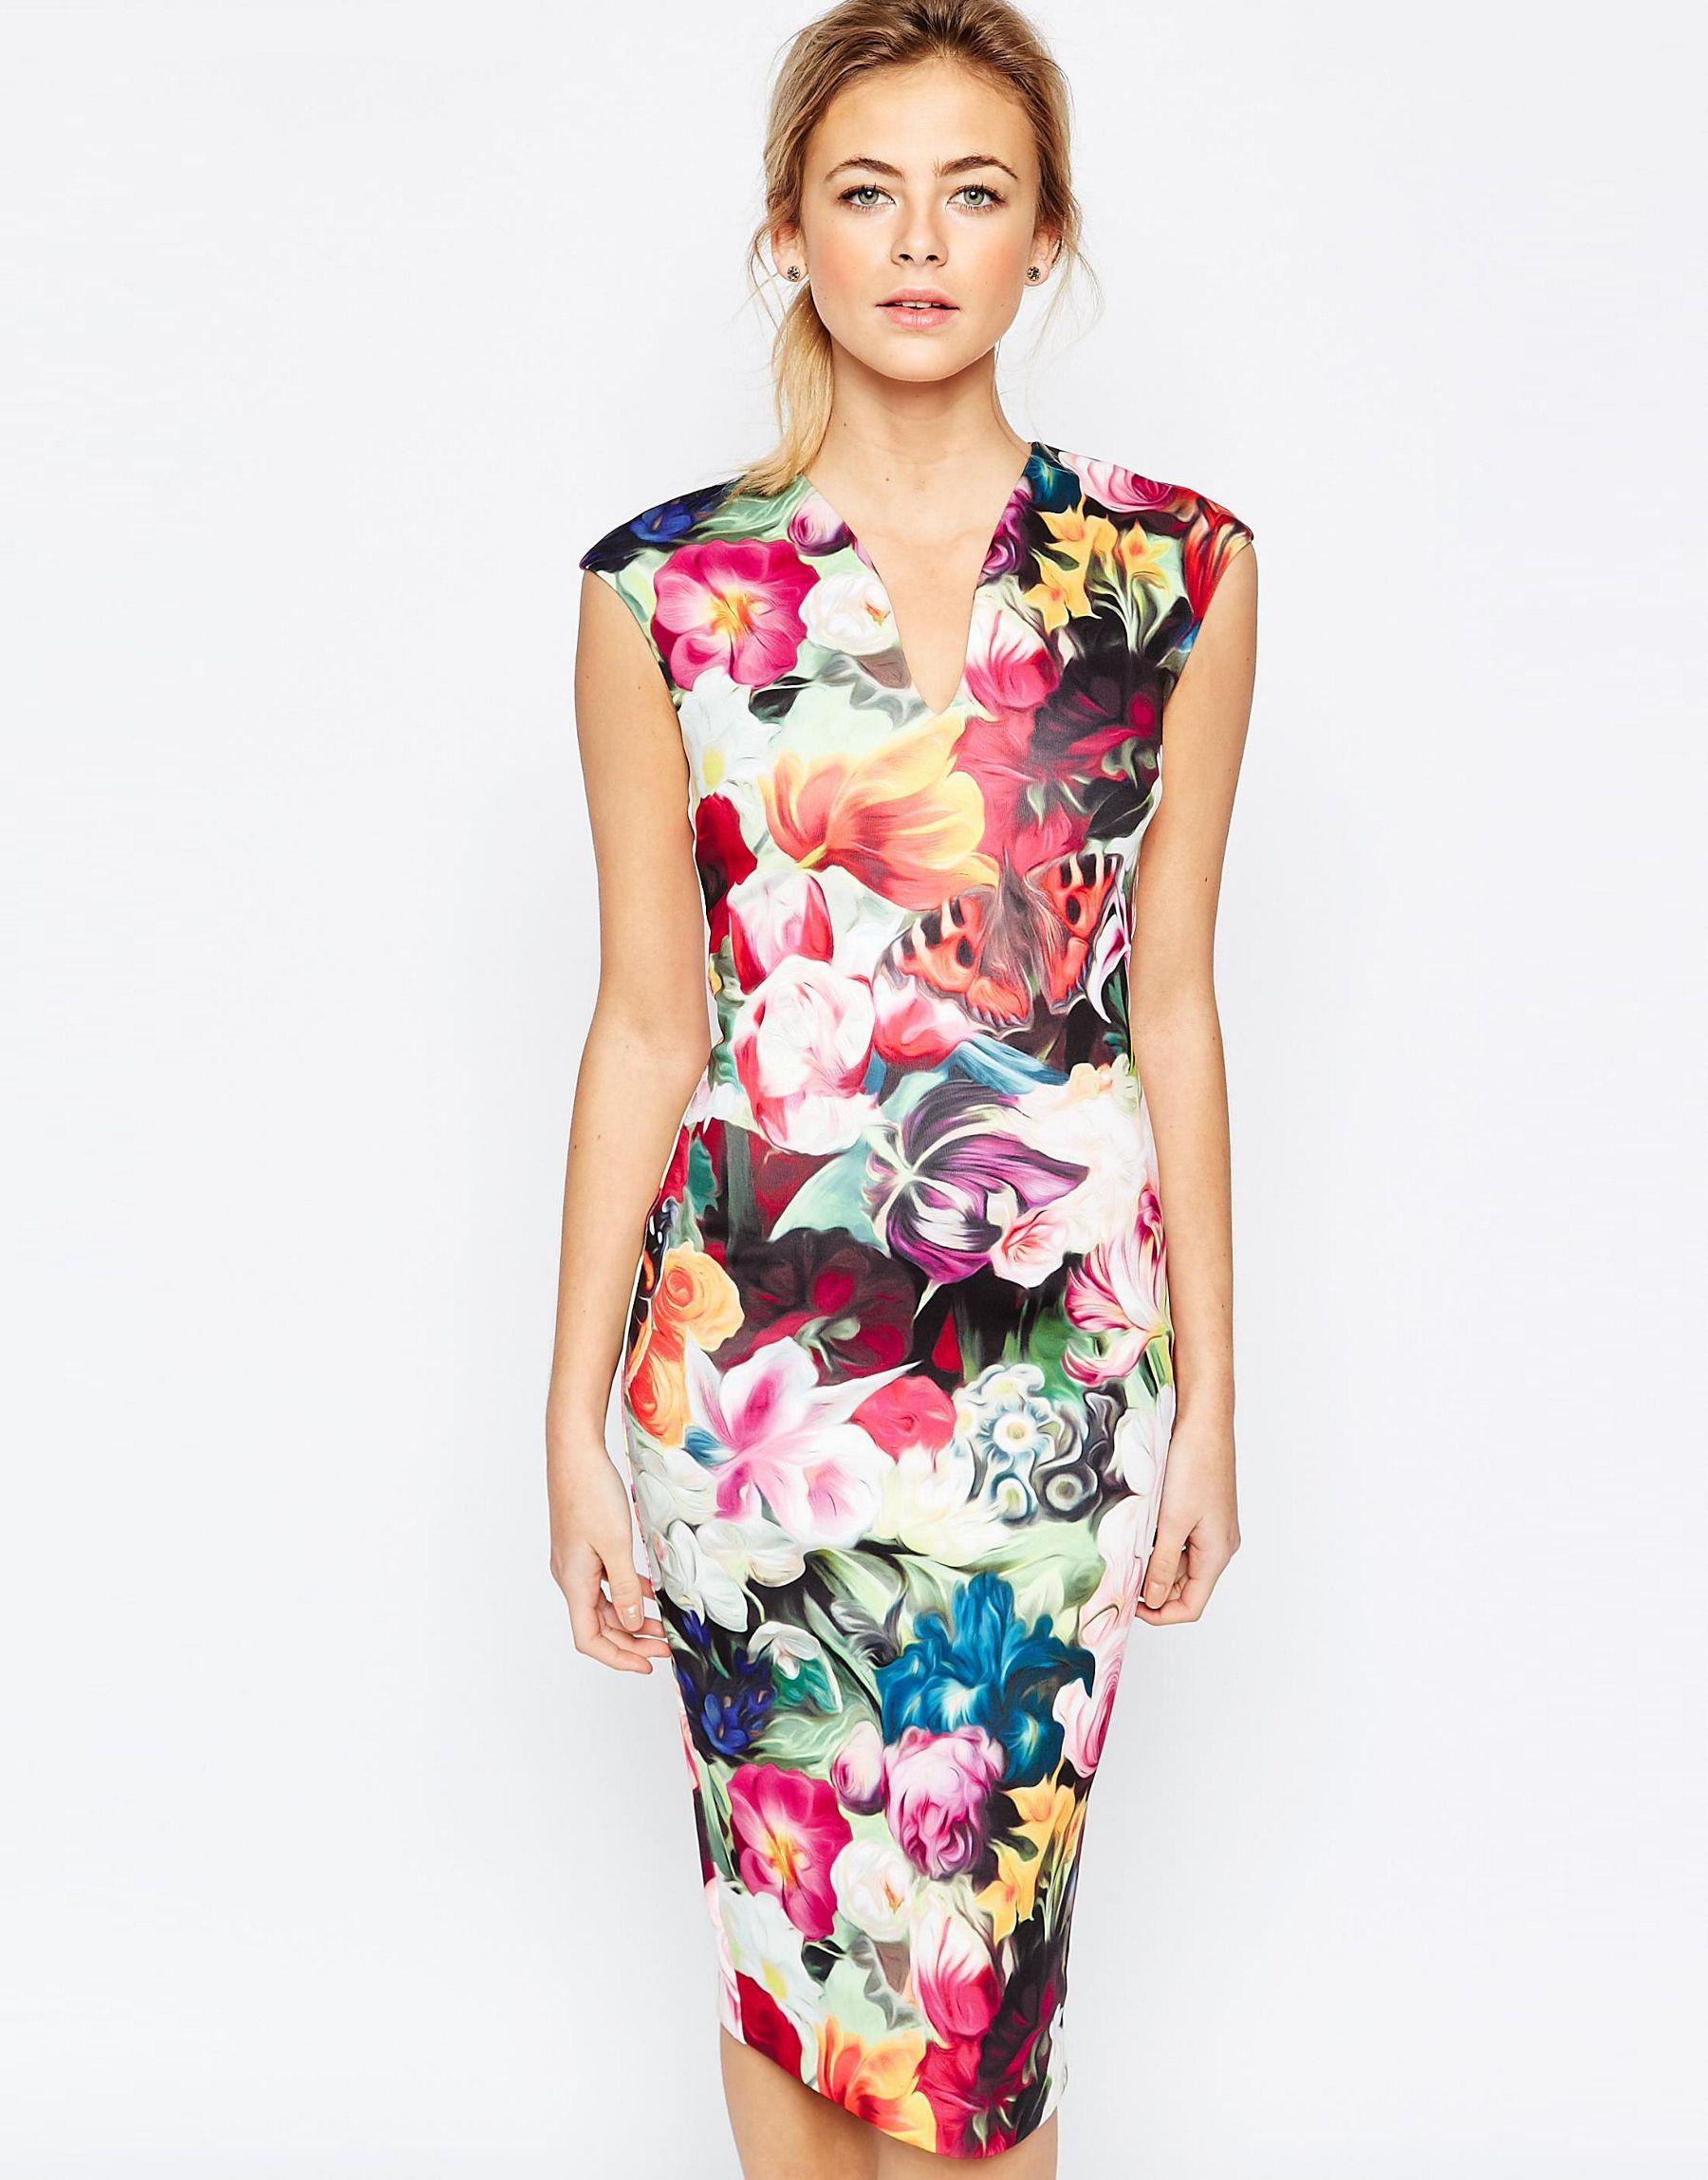 2da2c56f72ea9e Lyst - Ted Baker Floral Swirl Print Dress